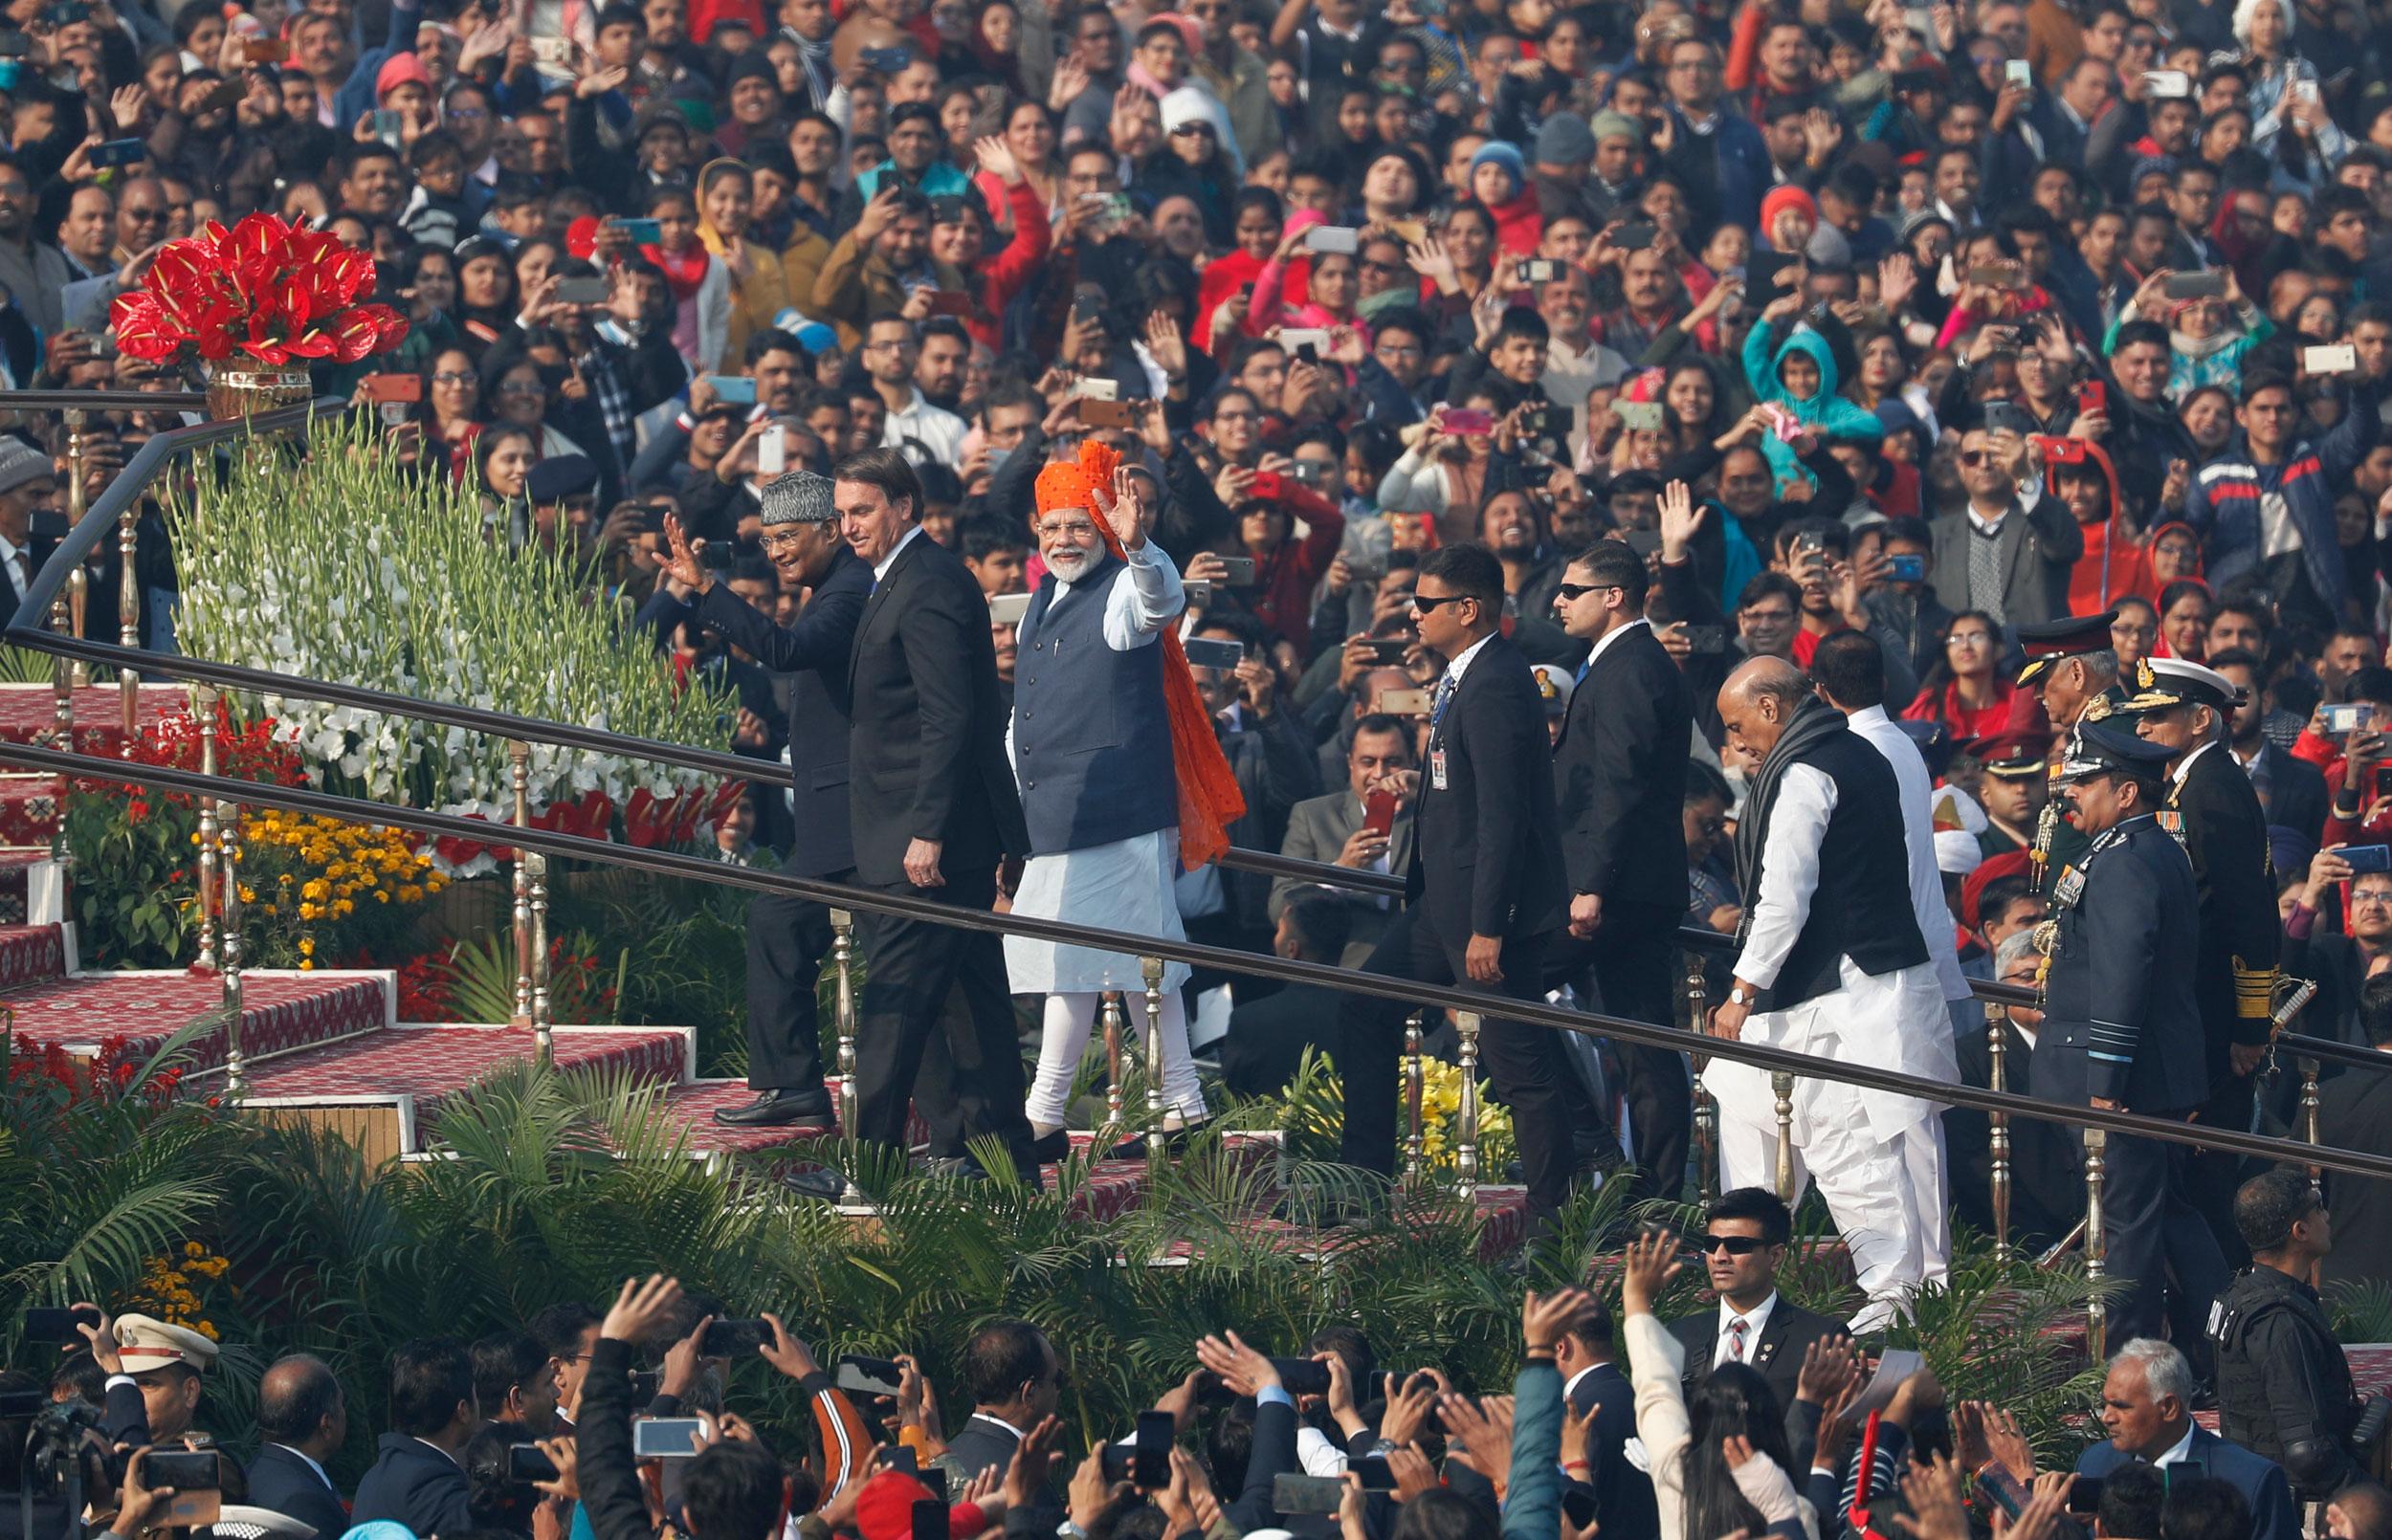 President Ram Nath Kovind, Brazilian President Jair Bolsonaro and Prime Minister Narendra Modi at the Republic Day Parade in New Delhi on Sunday.